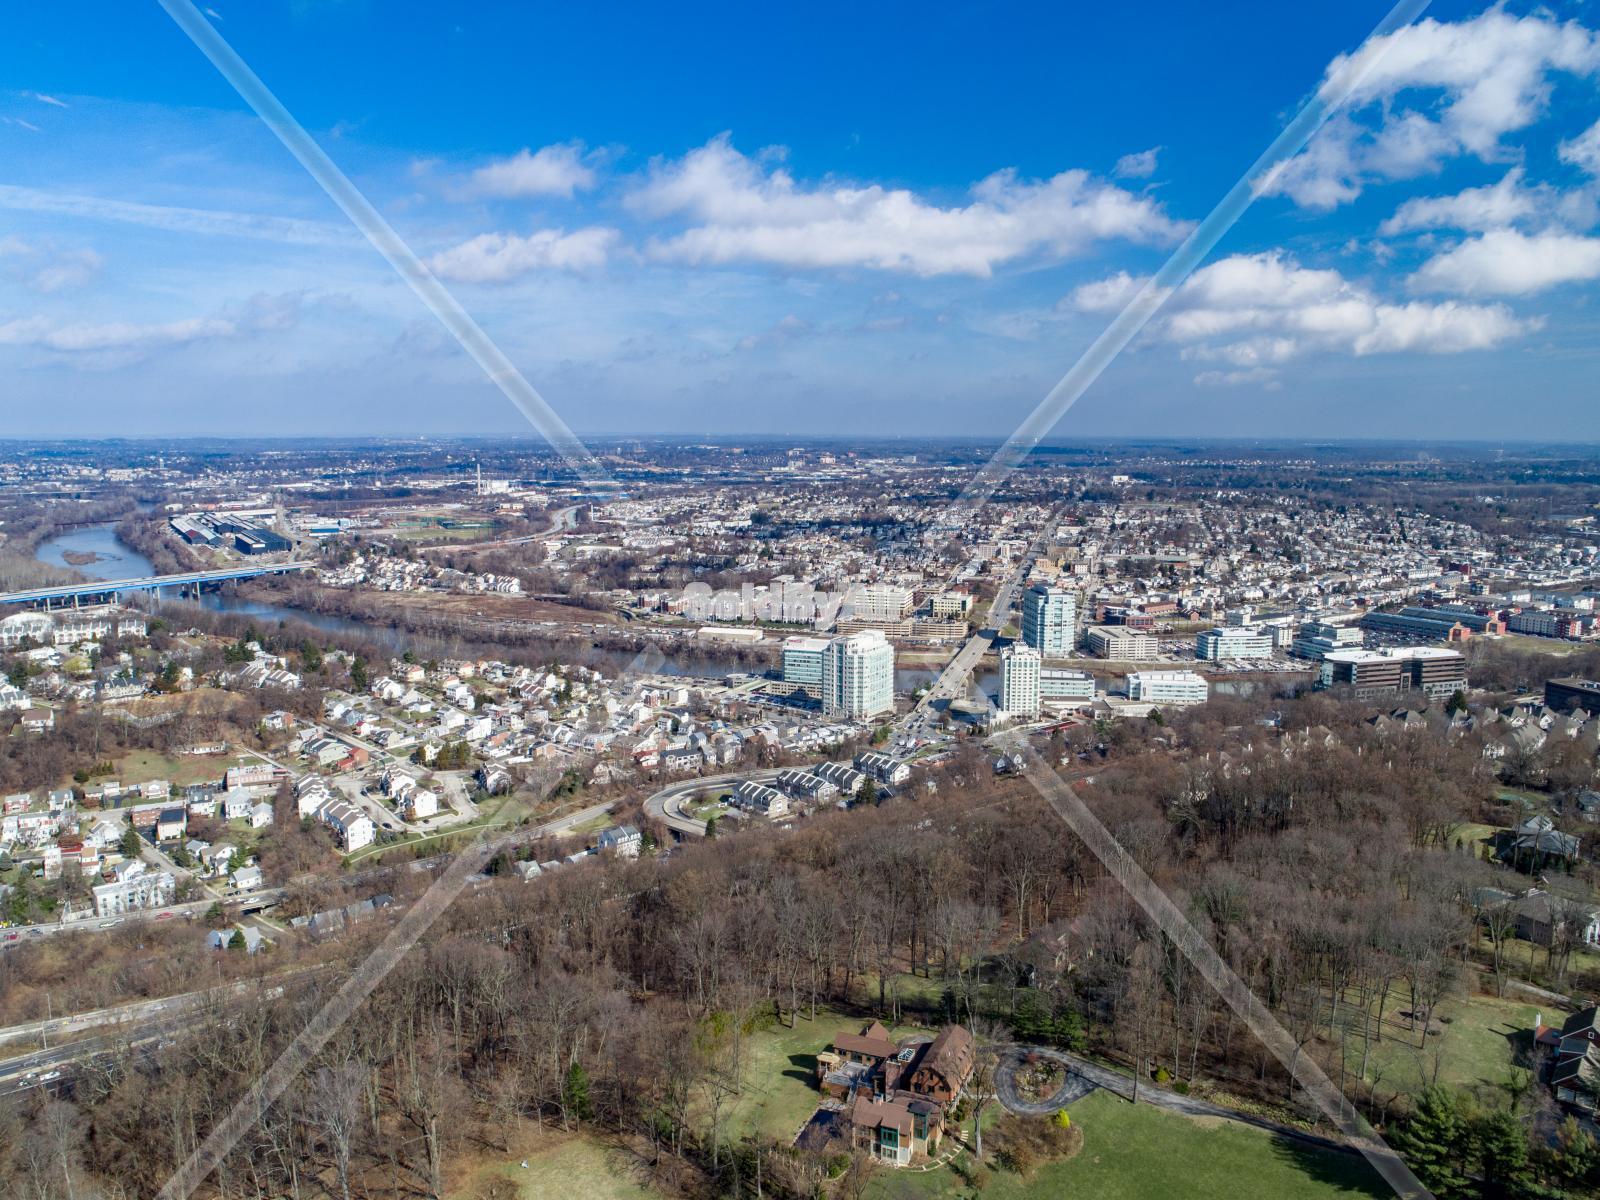 Drone Photo of Skyline in Conshohocken Pennsylvania